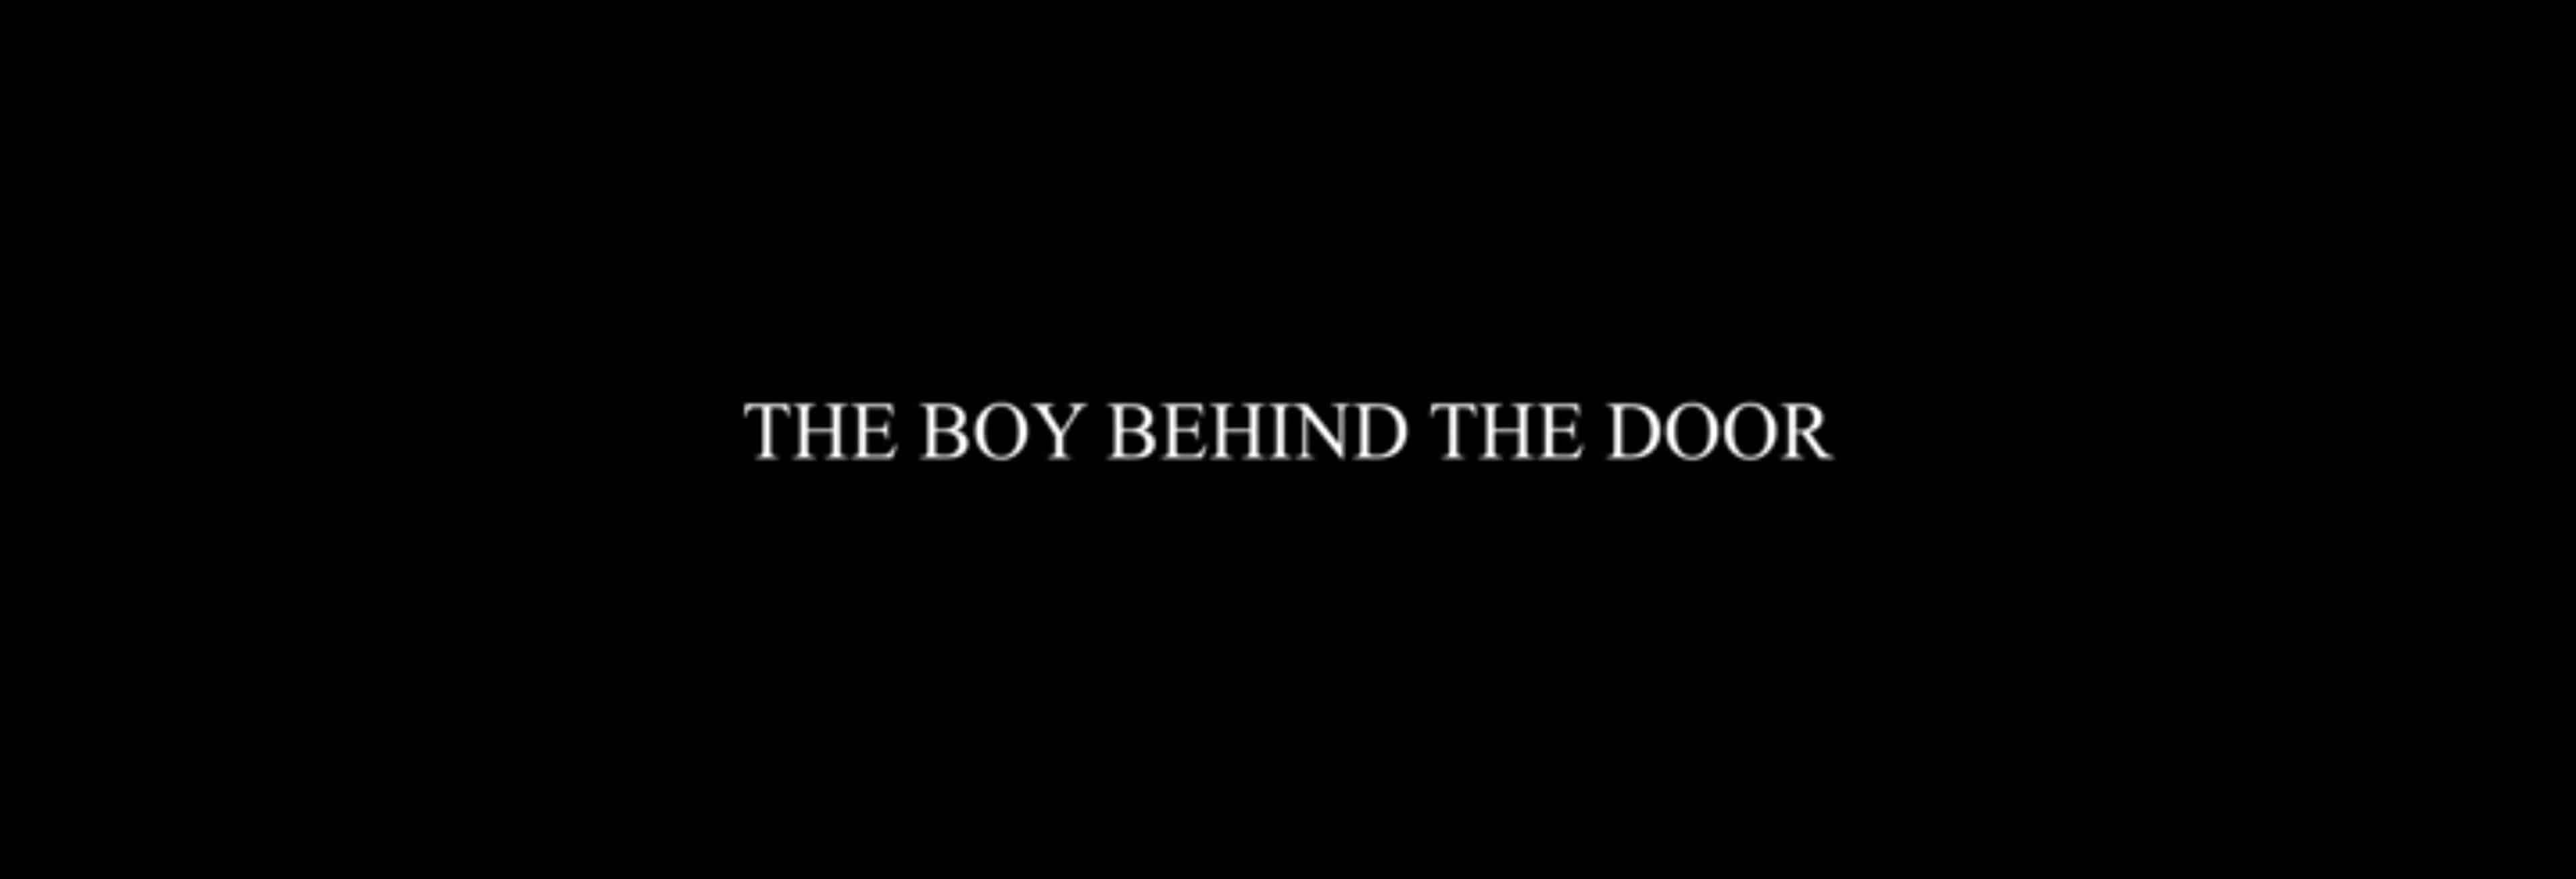 Title Card - The Boy Behind The Door (2021)